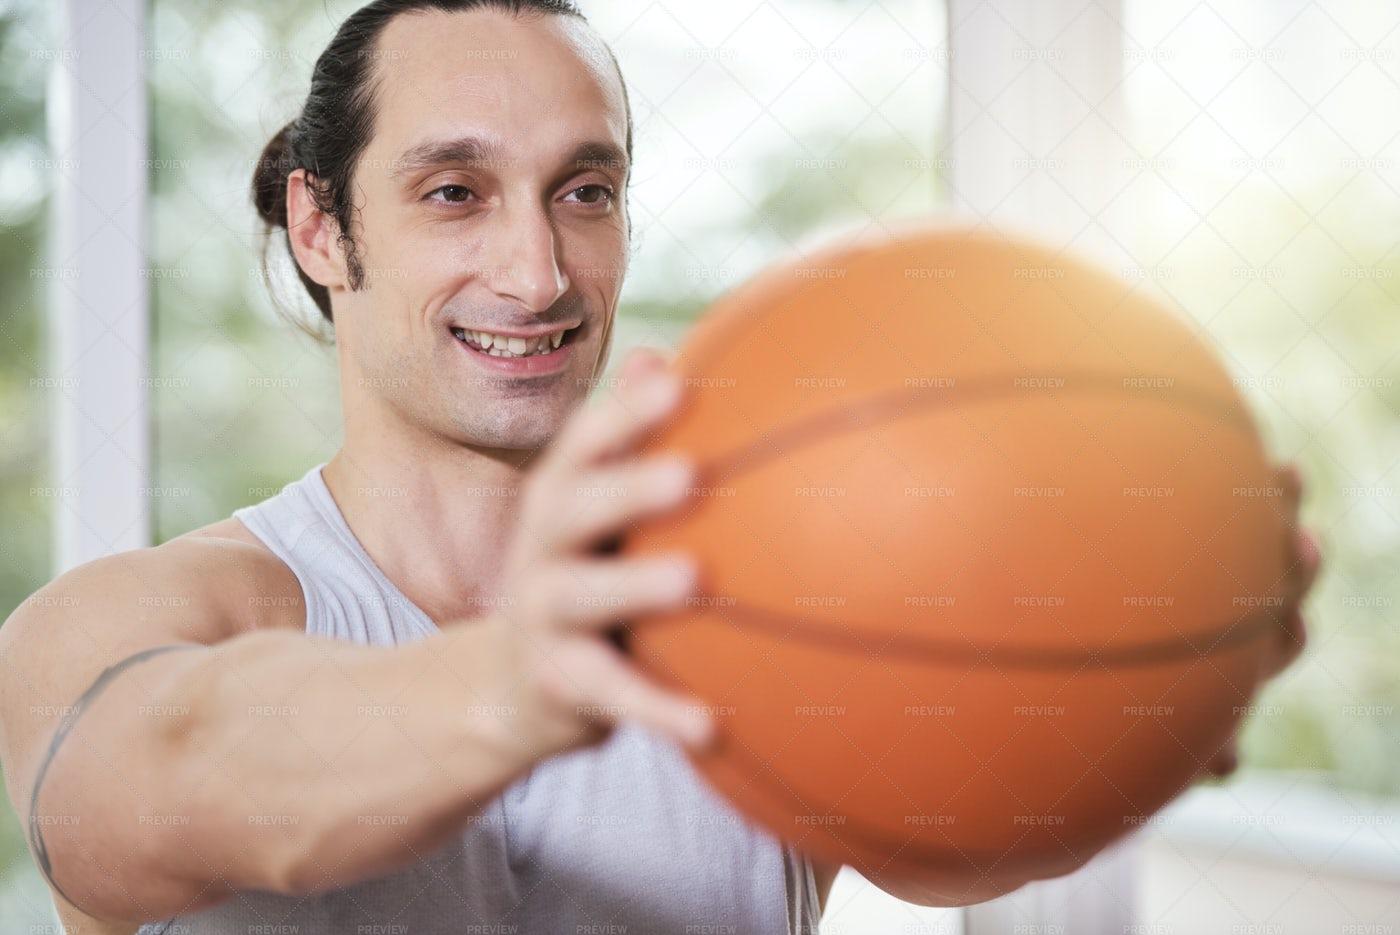 Smiling Man Doing Balance Exercise: Stock Photos